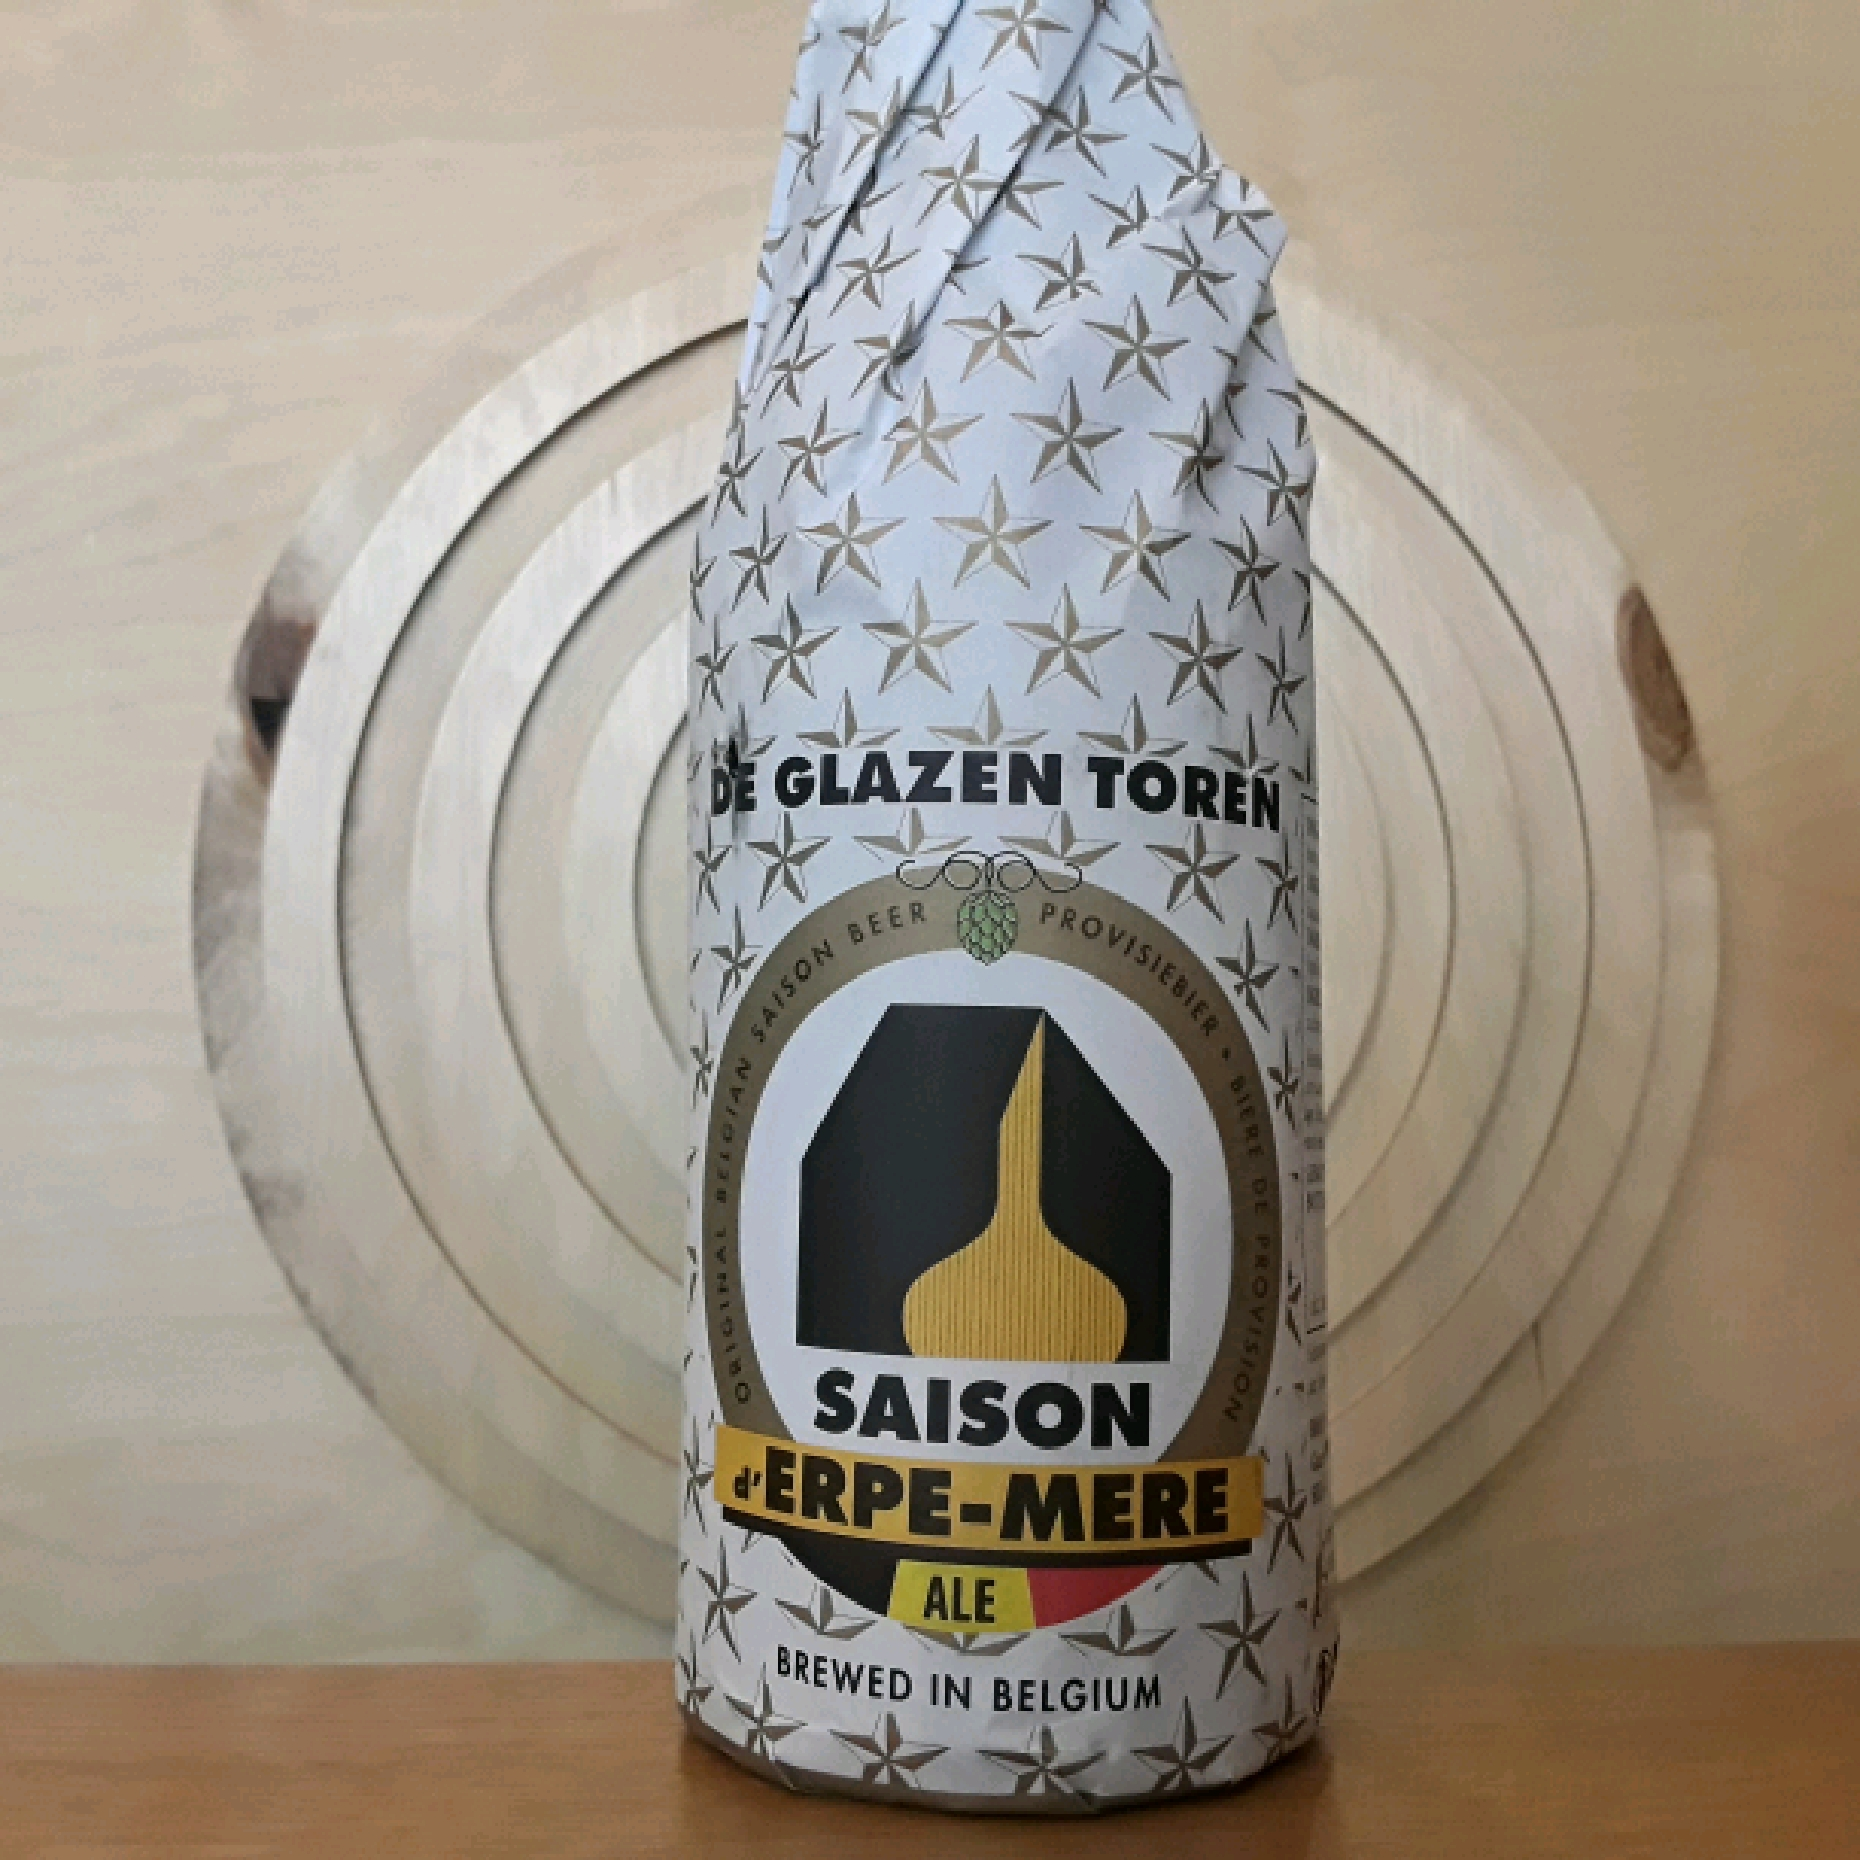 Brouwerij De Glazen Toren | Saison d'Erpe-Mere | Farmhouse Ale - Saison